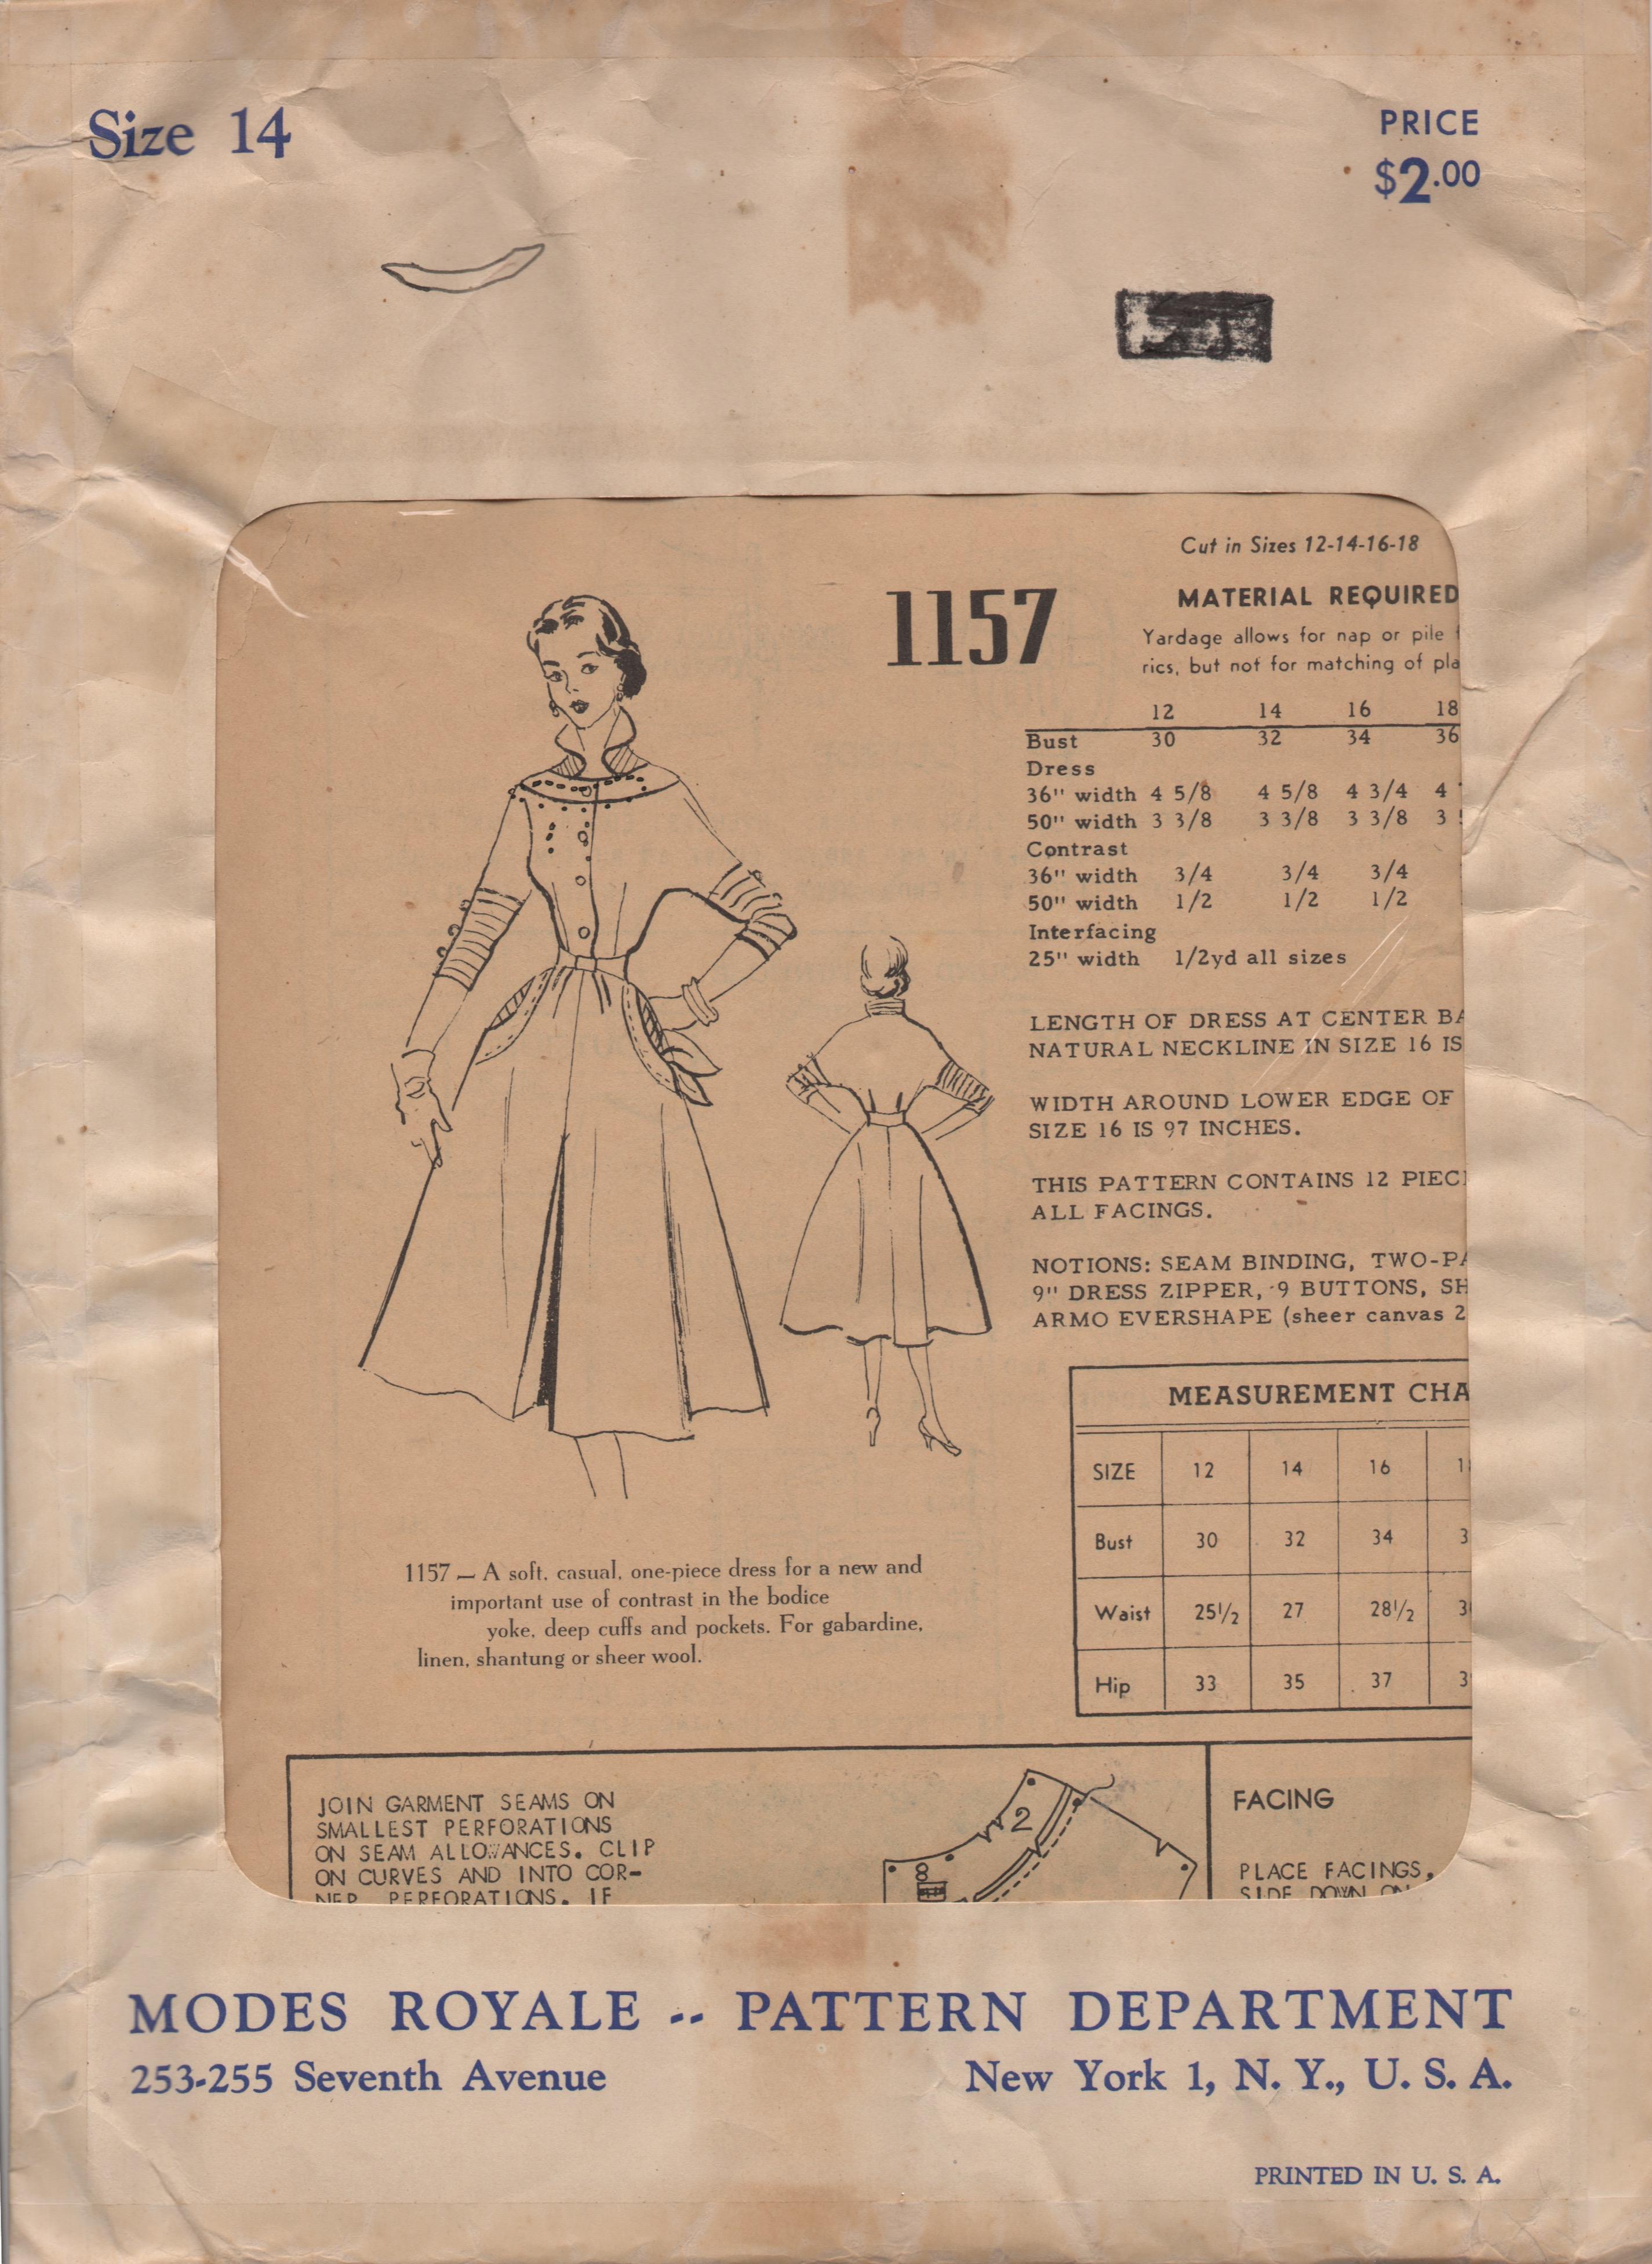 Modes Royale 1157